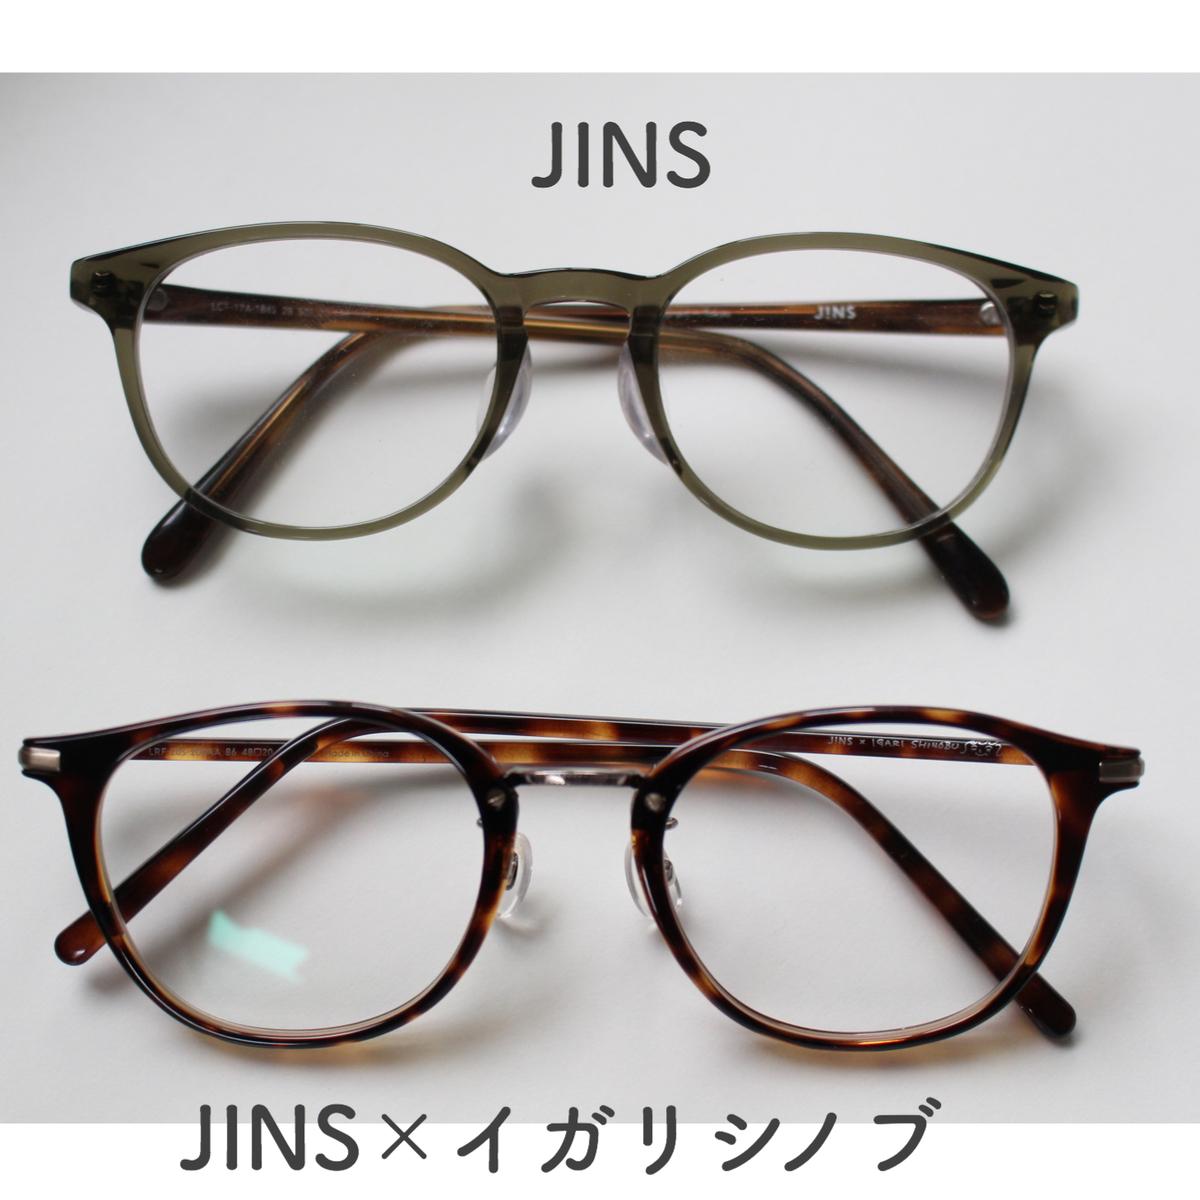 JINS×イガリシノブ  美人見えメガネ 比較